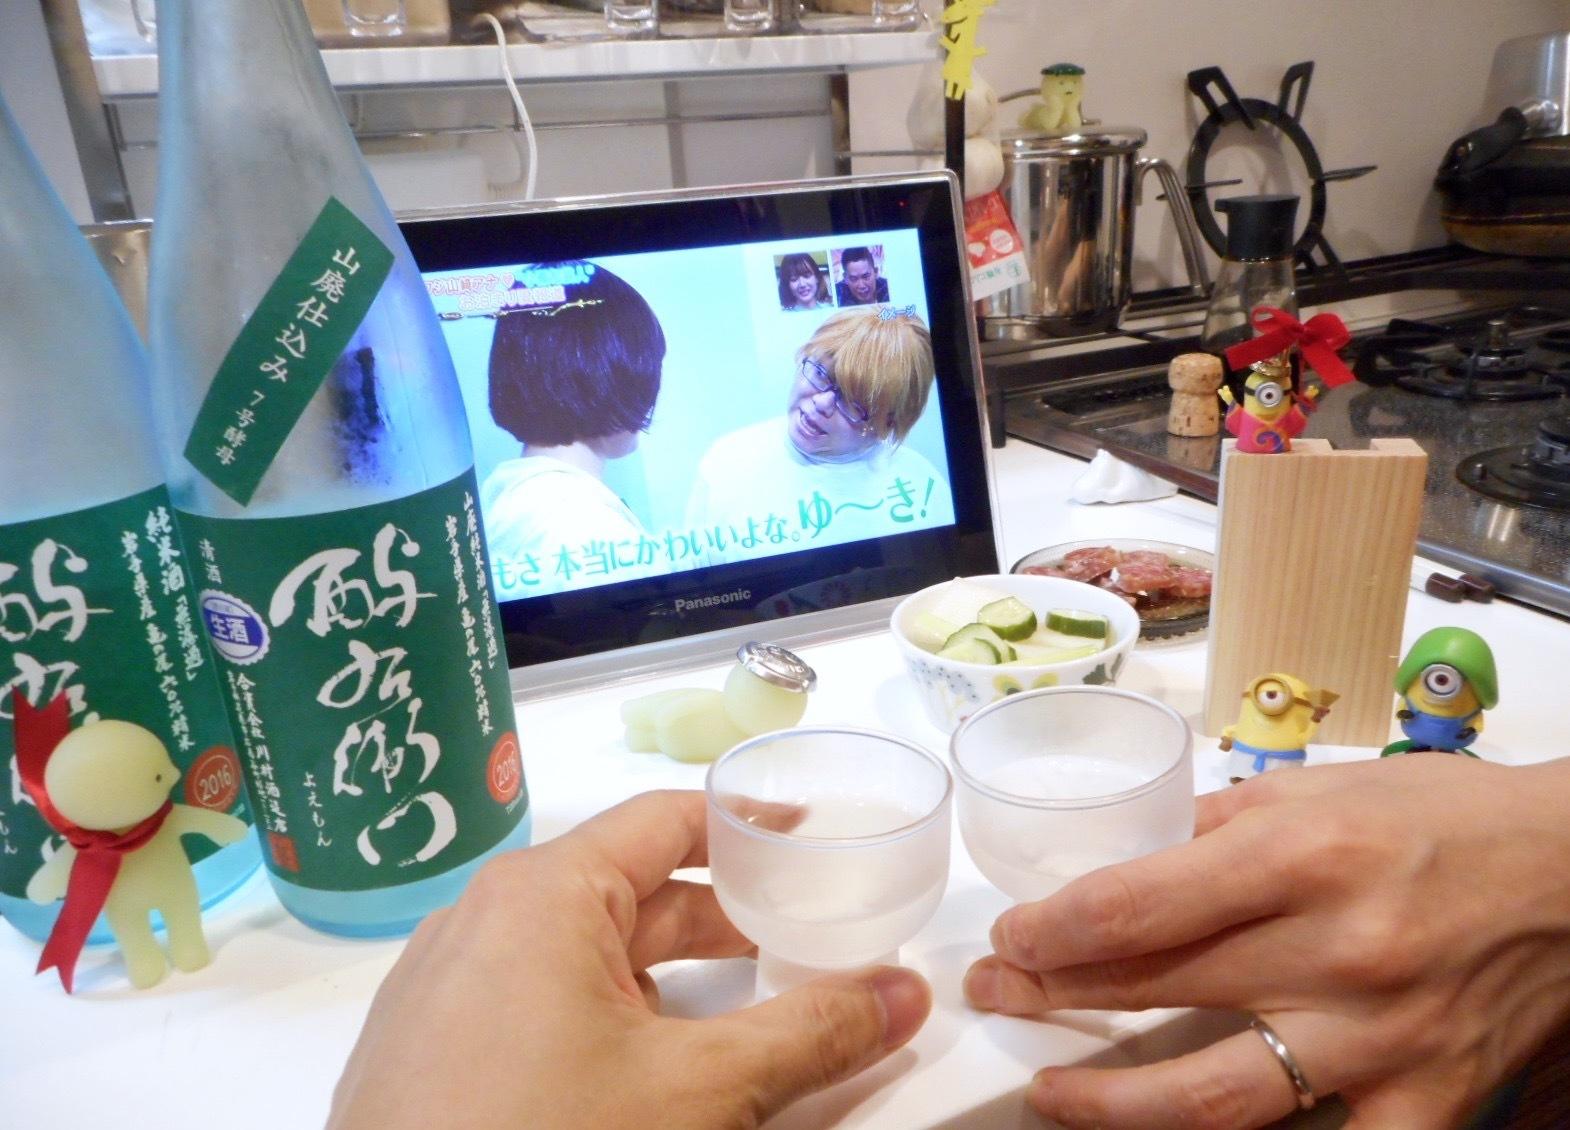 yoemon_kamenoo_yamahai28by9.jpg